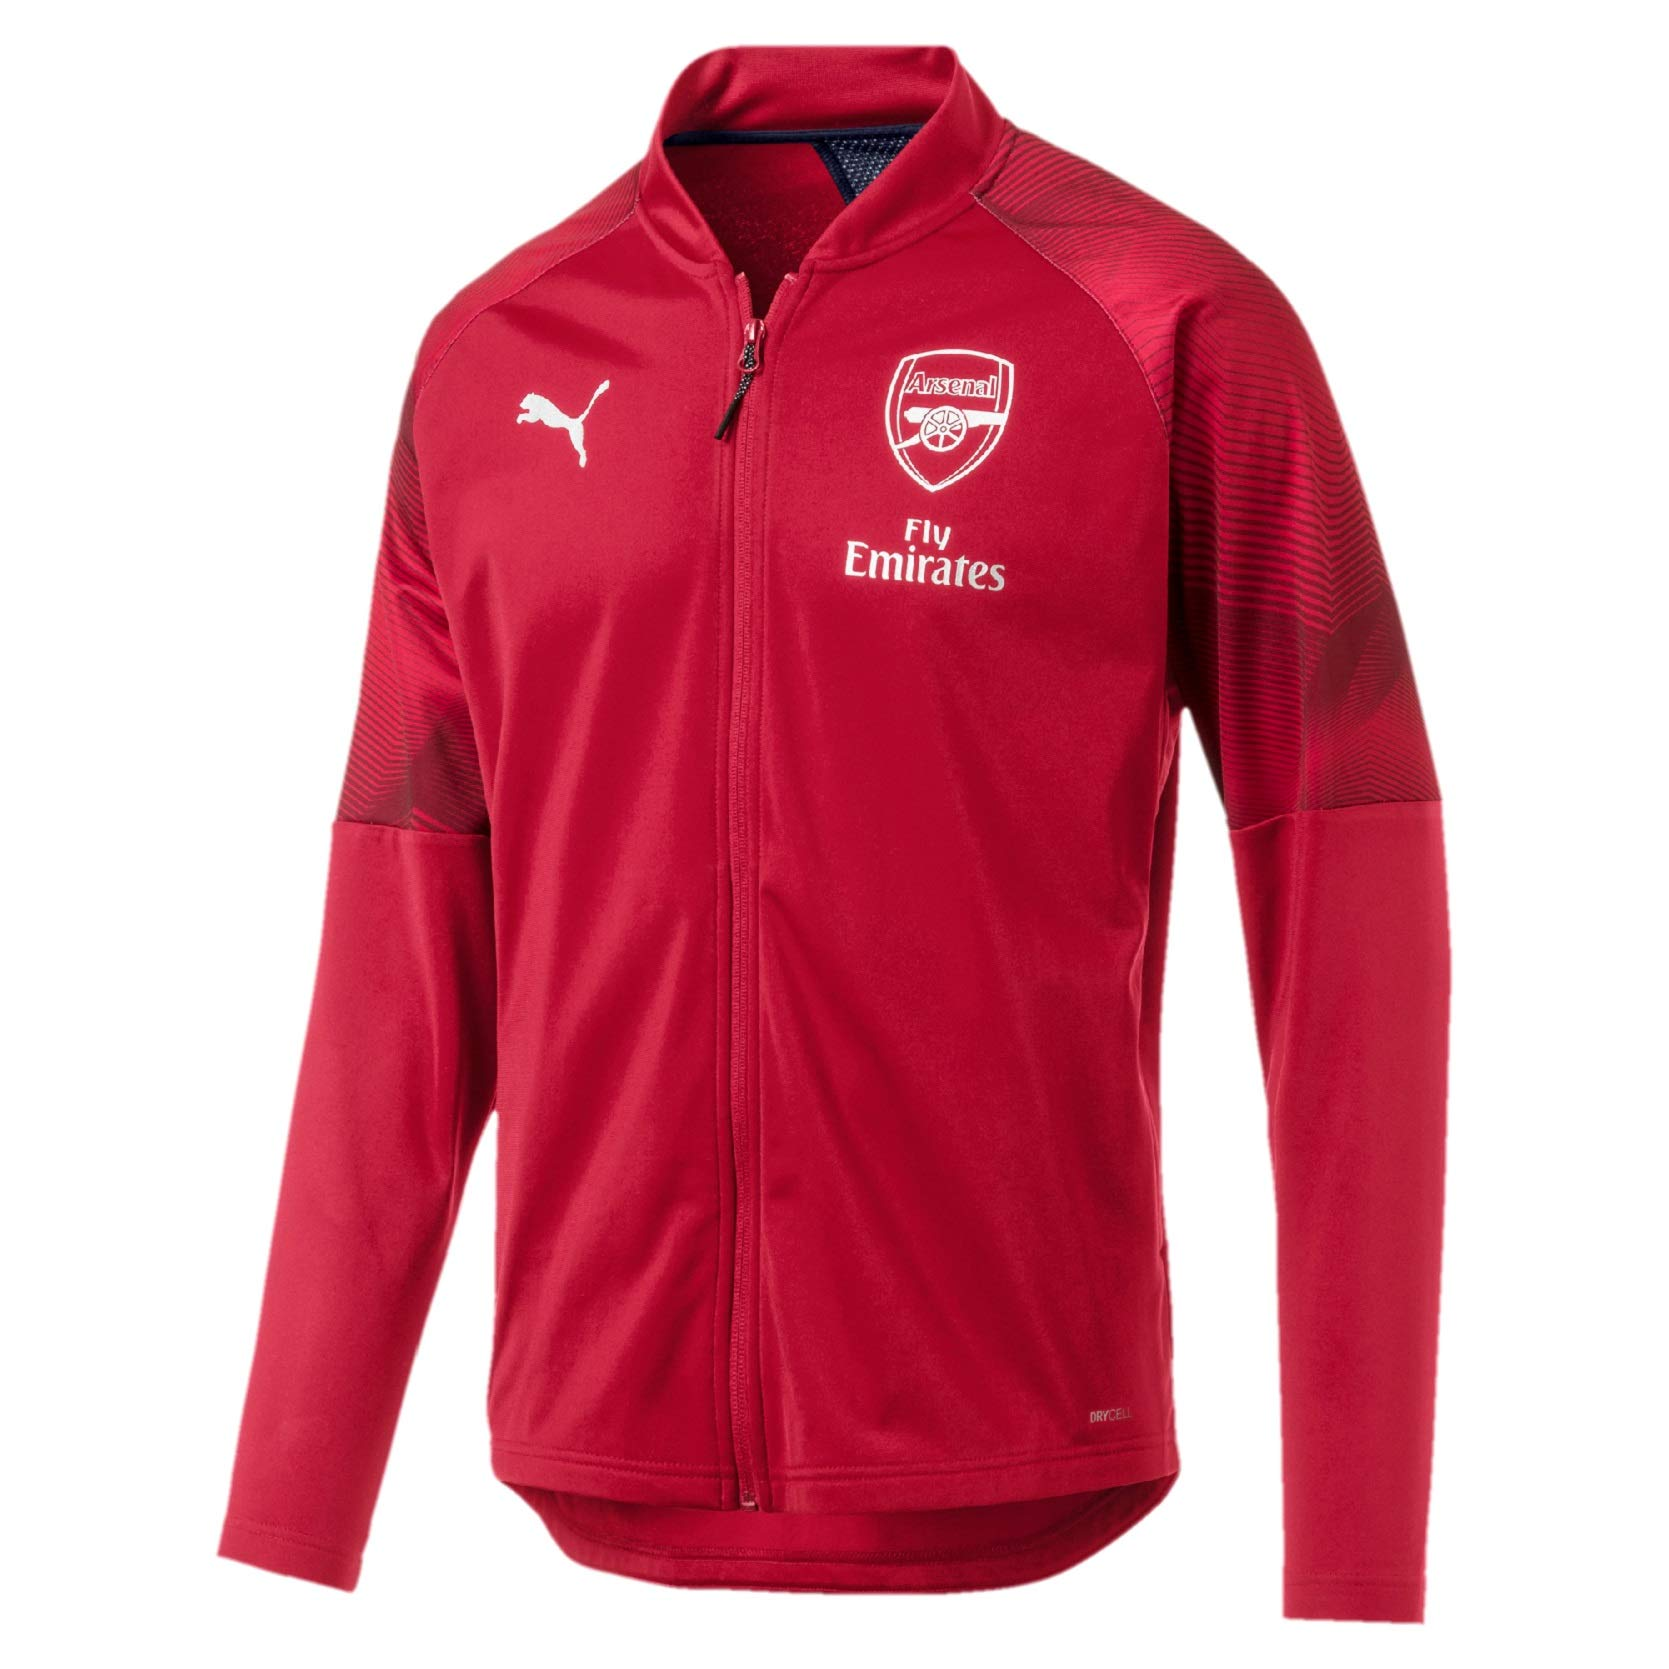 PUMA Mens Arsenal Fc Stadium Jacket Sponsor Logo